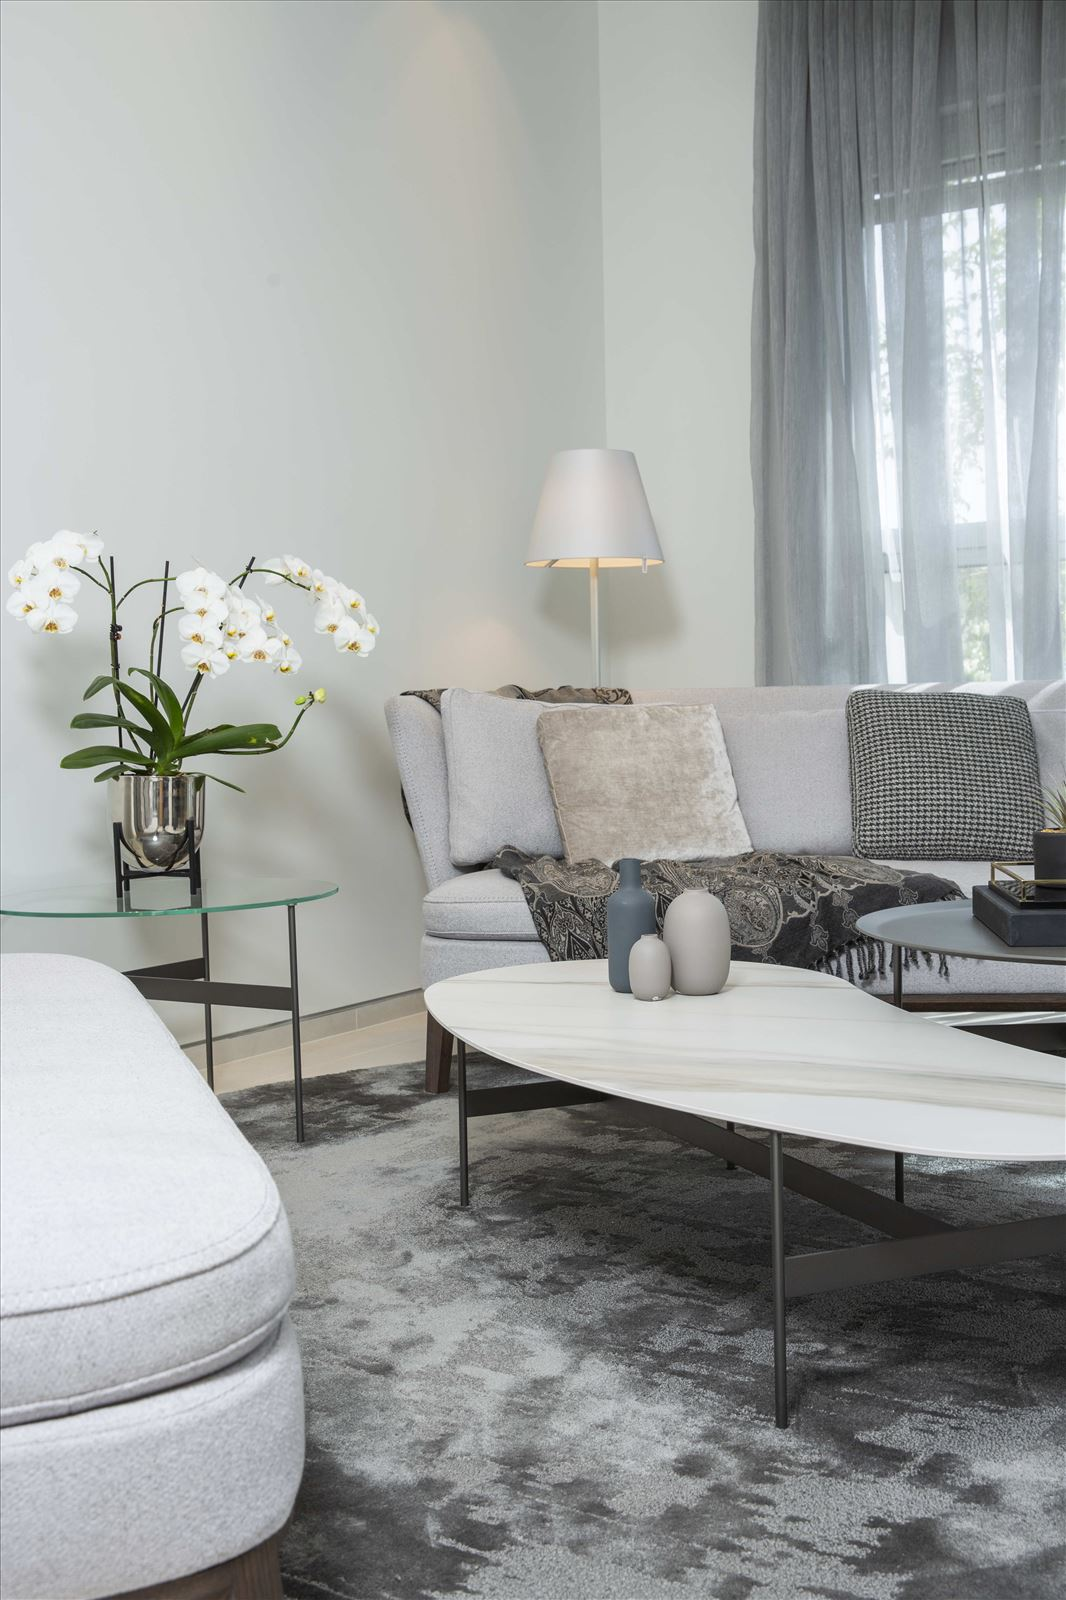 Tel Aviv apartment in Parisian aroma תאורה בסלון מבית קמחי תאורה